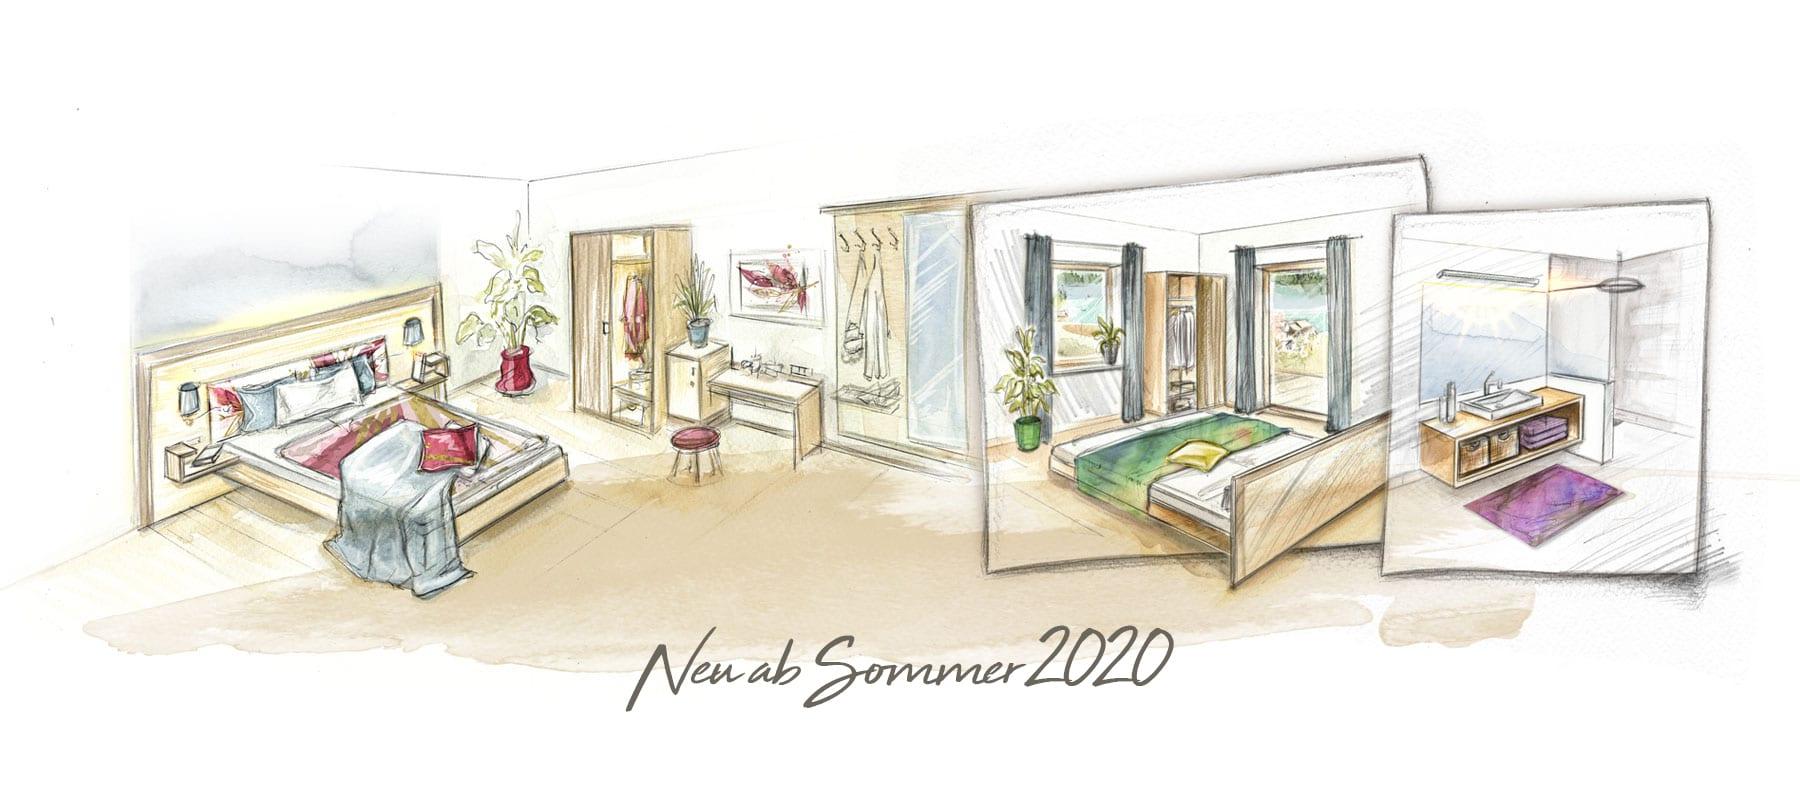 winkler-tuschnig-neu-ab-sommer-2020